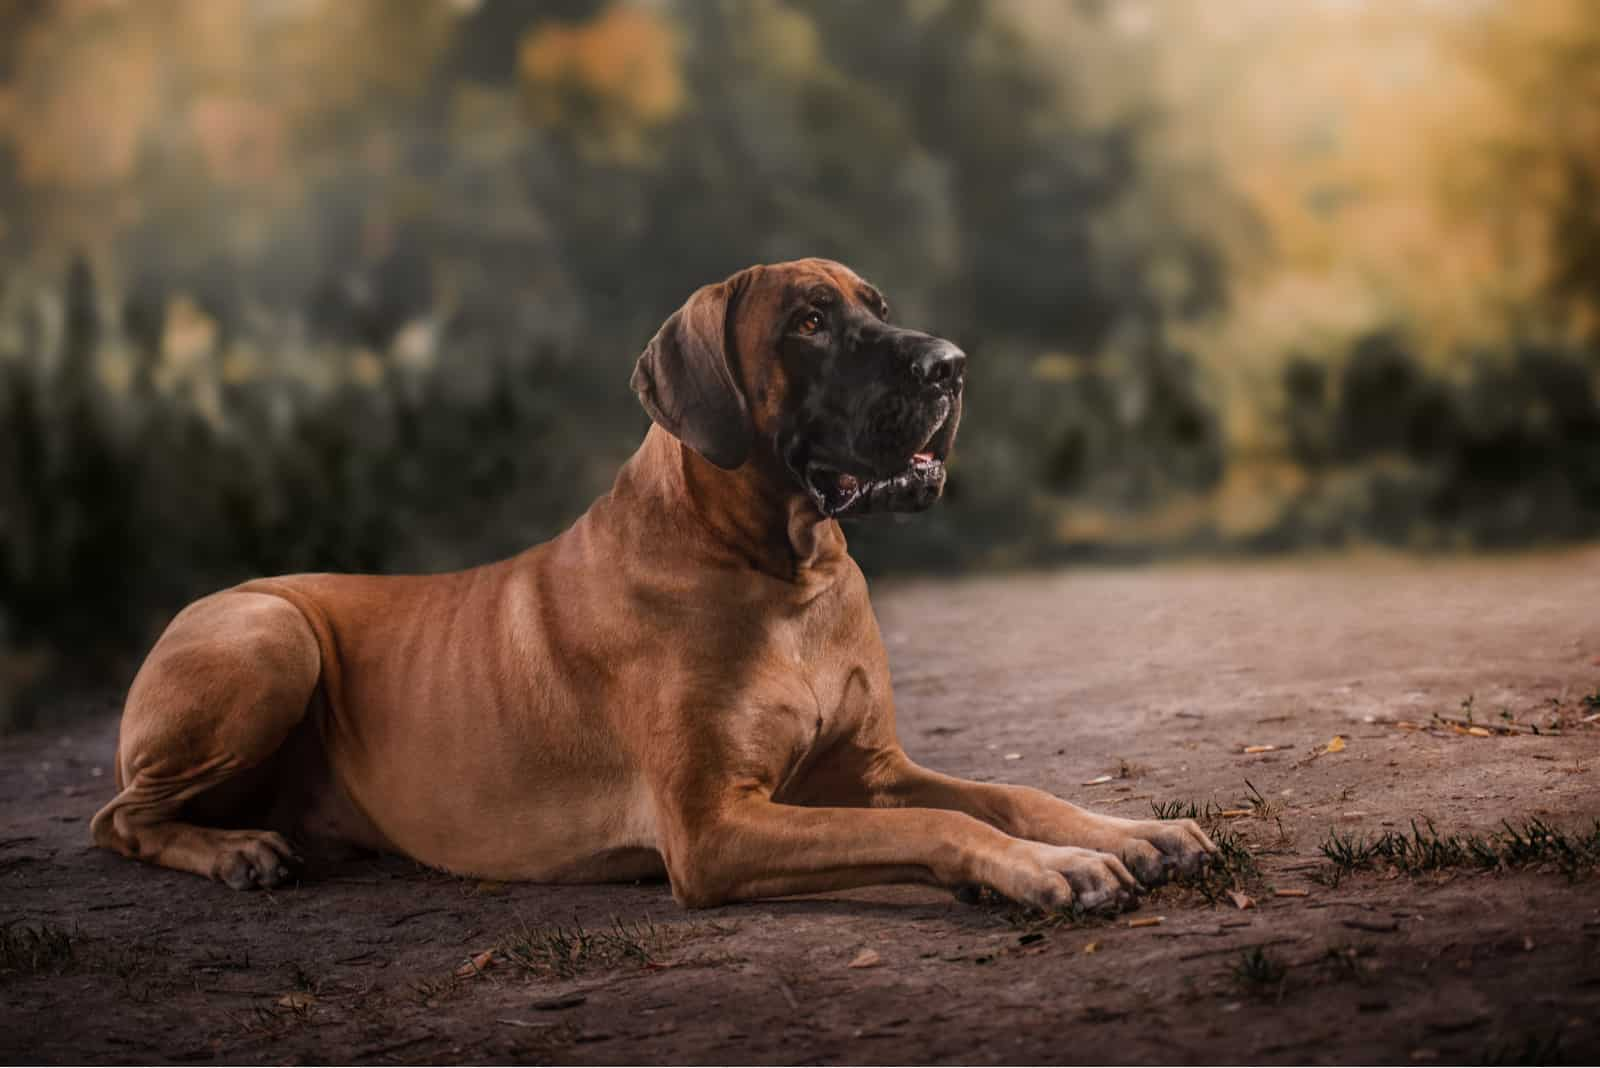 Great dane Dog lying outdoors